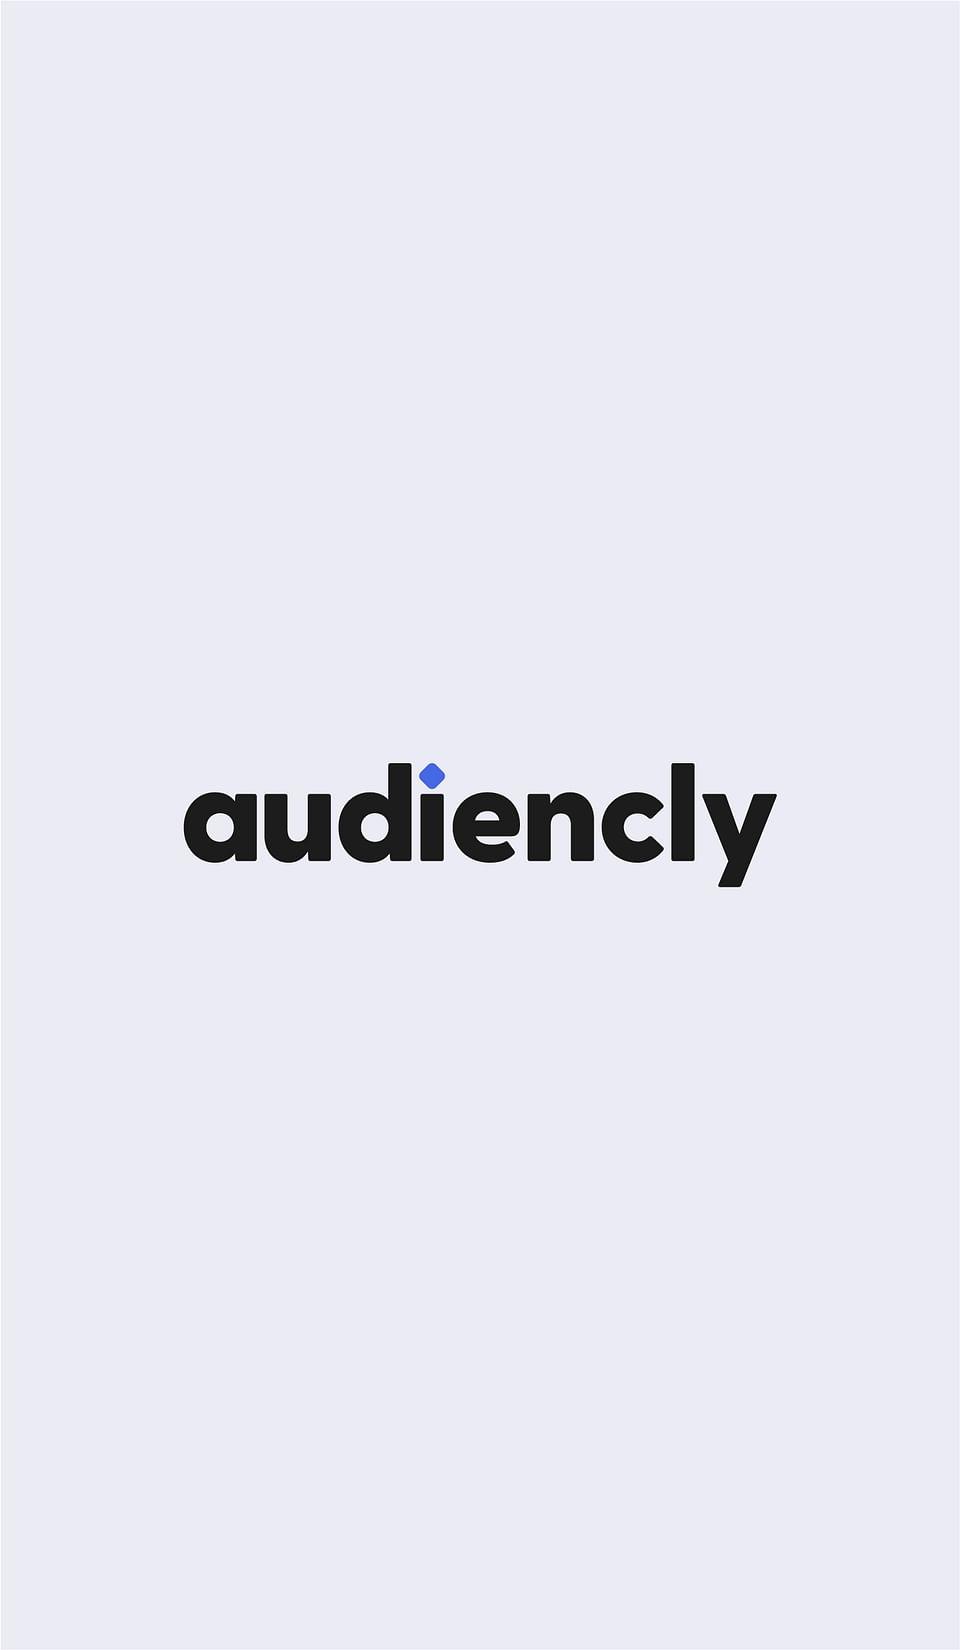 HelloFresh x Audiencly